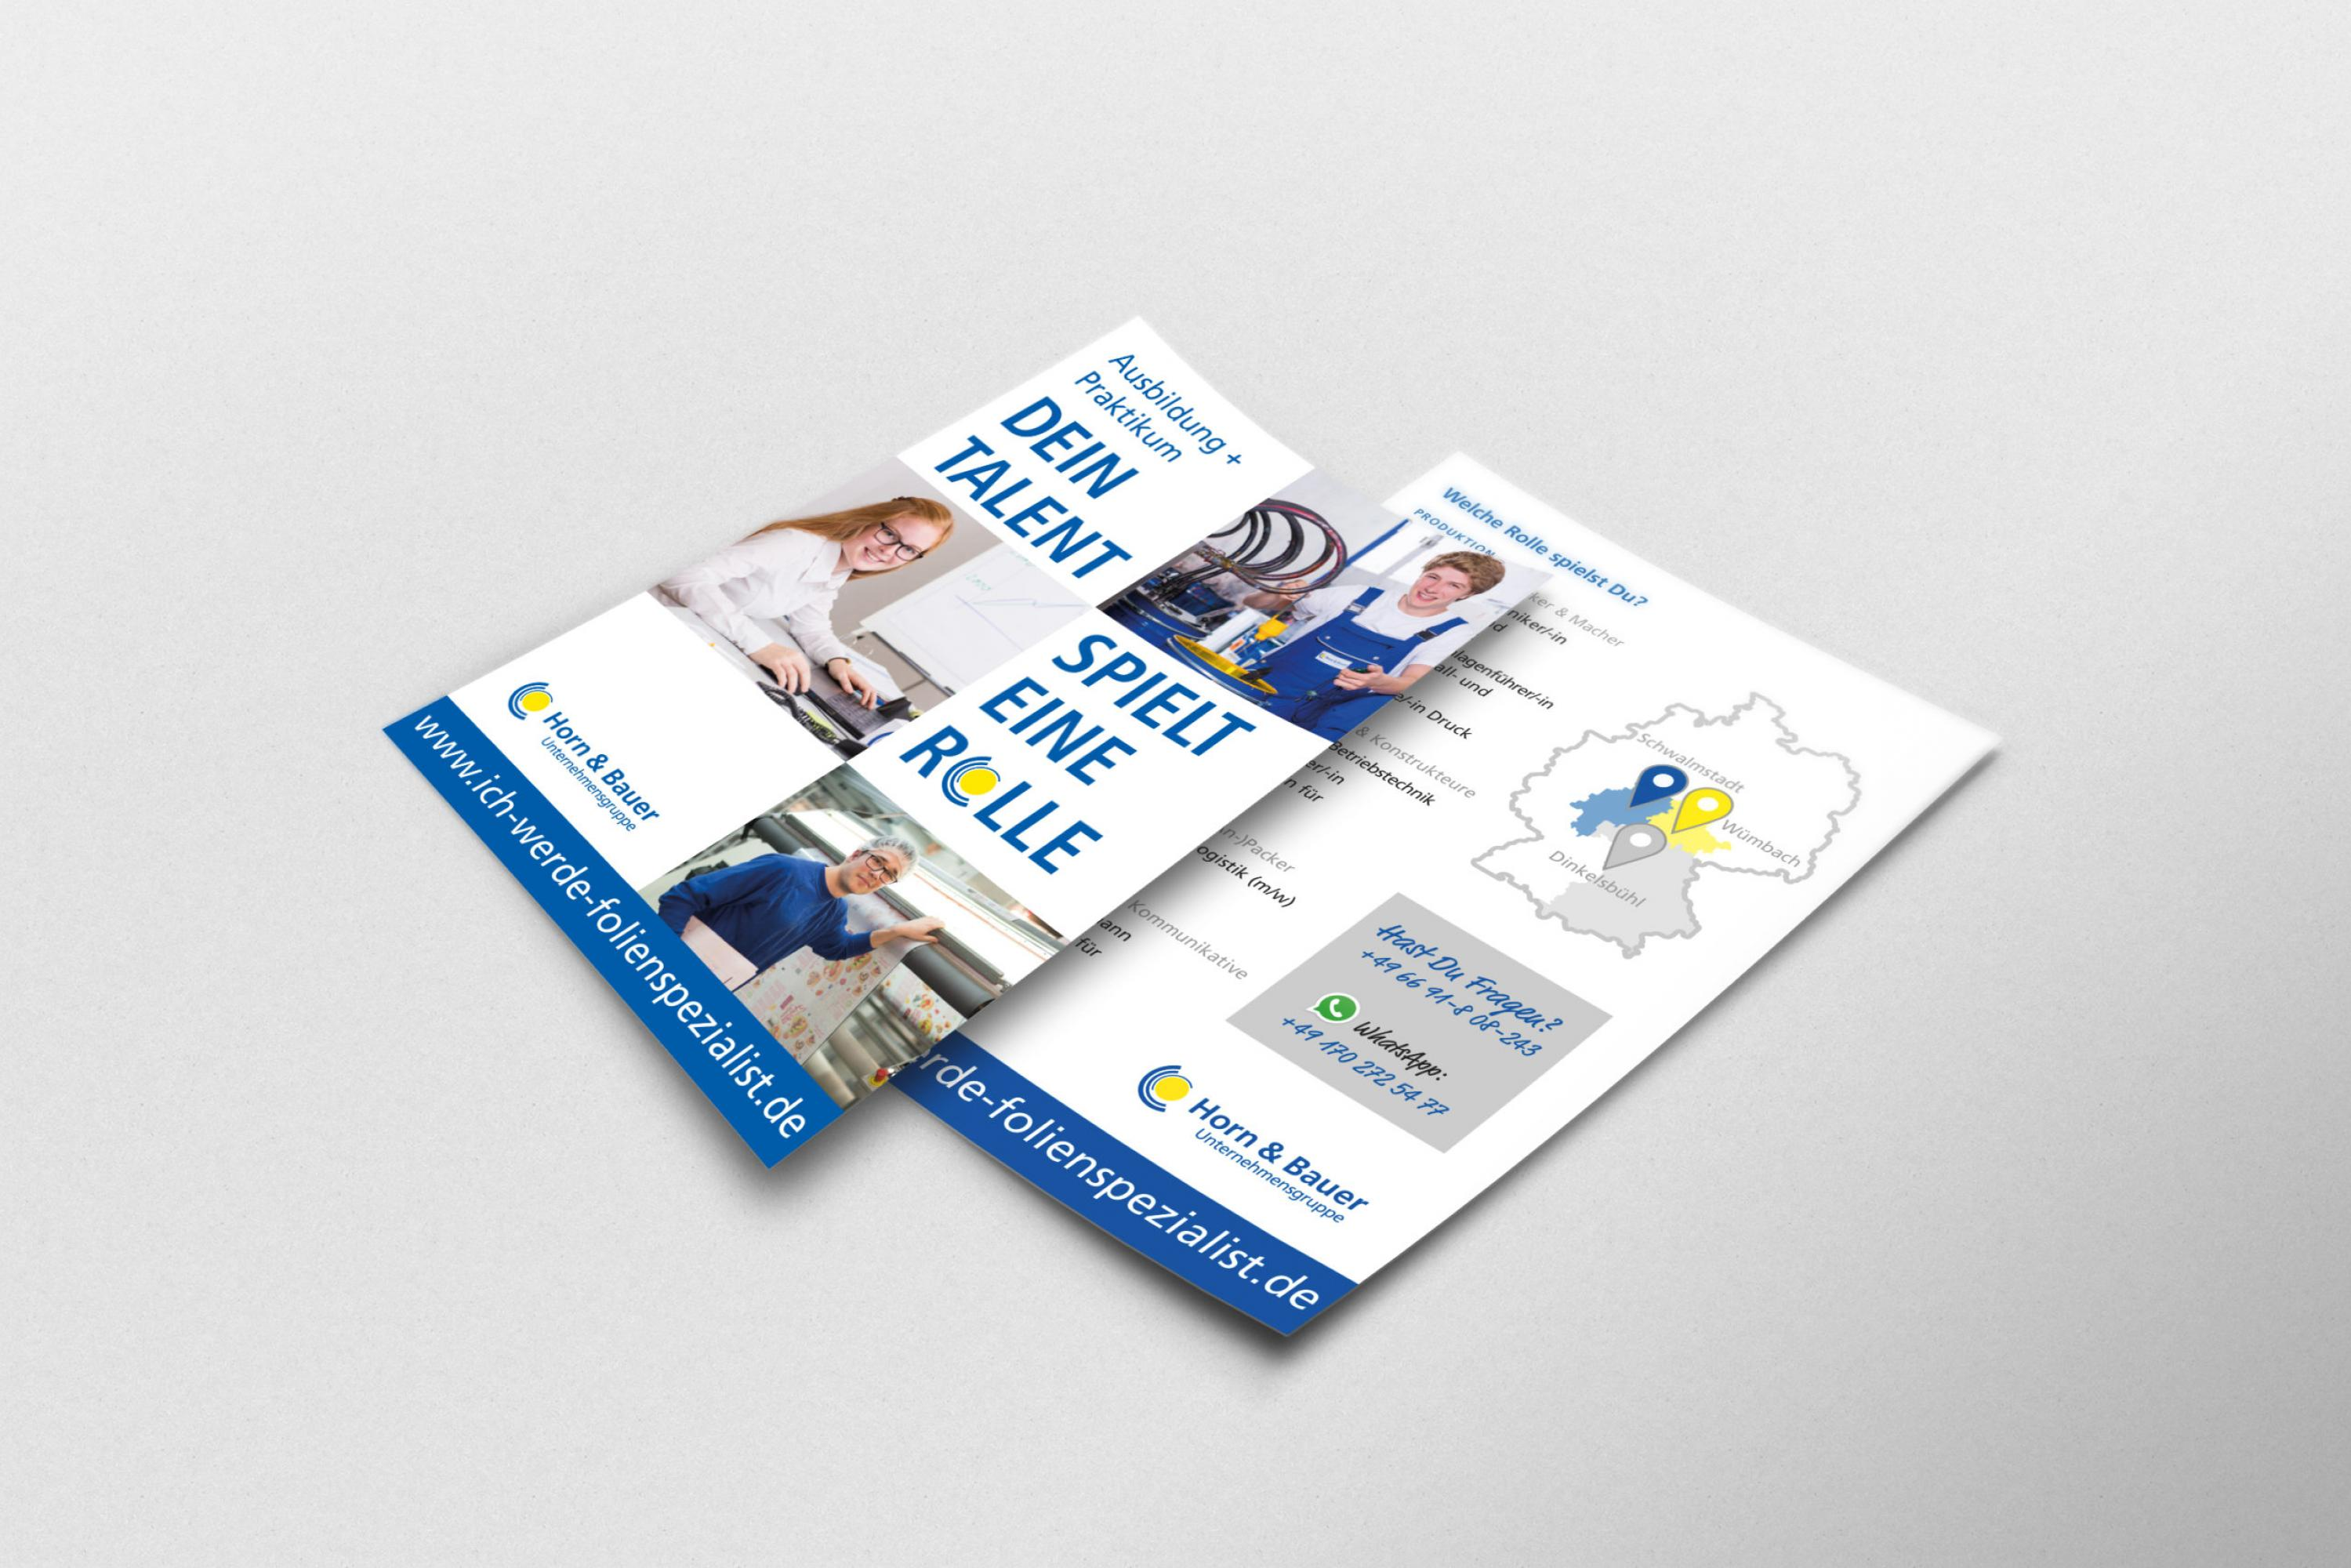 Webdesign-Printdesign-Ausbildungssuche-CorporateDesign-Horn-Bauer-Ausbildung_Flyer_A5